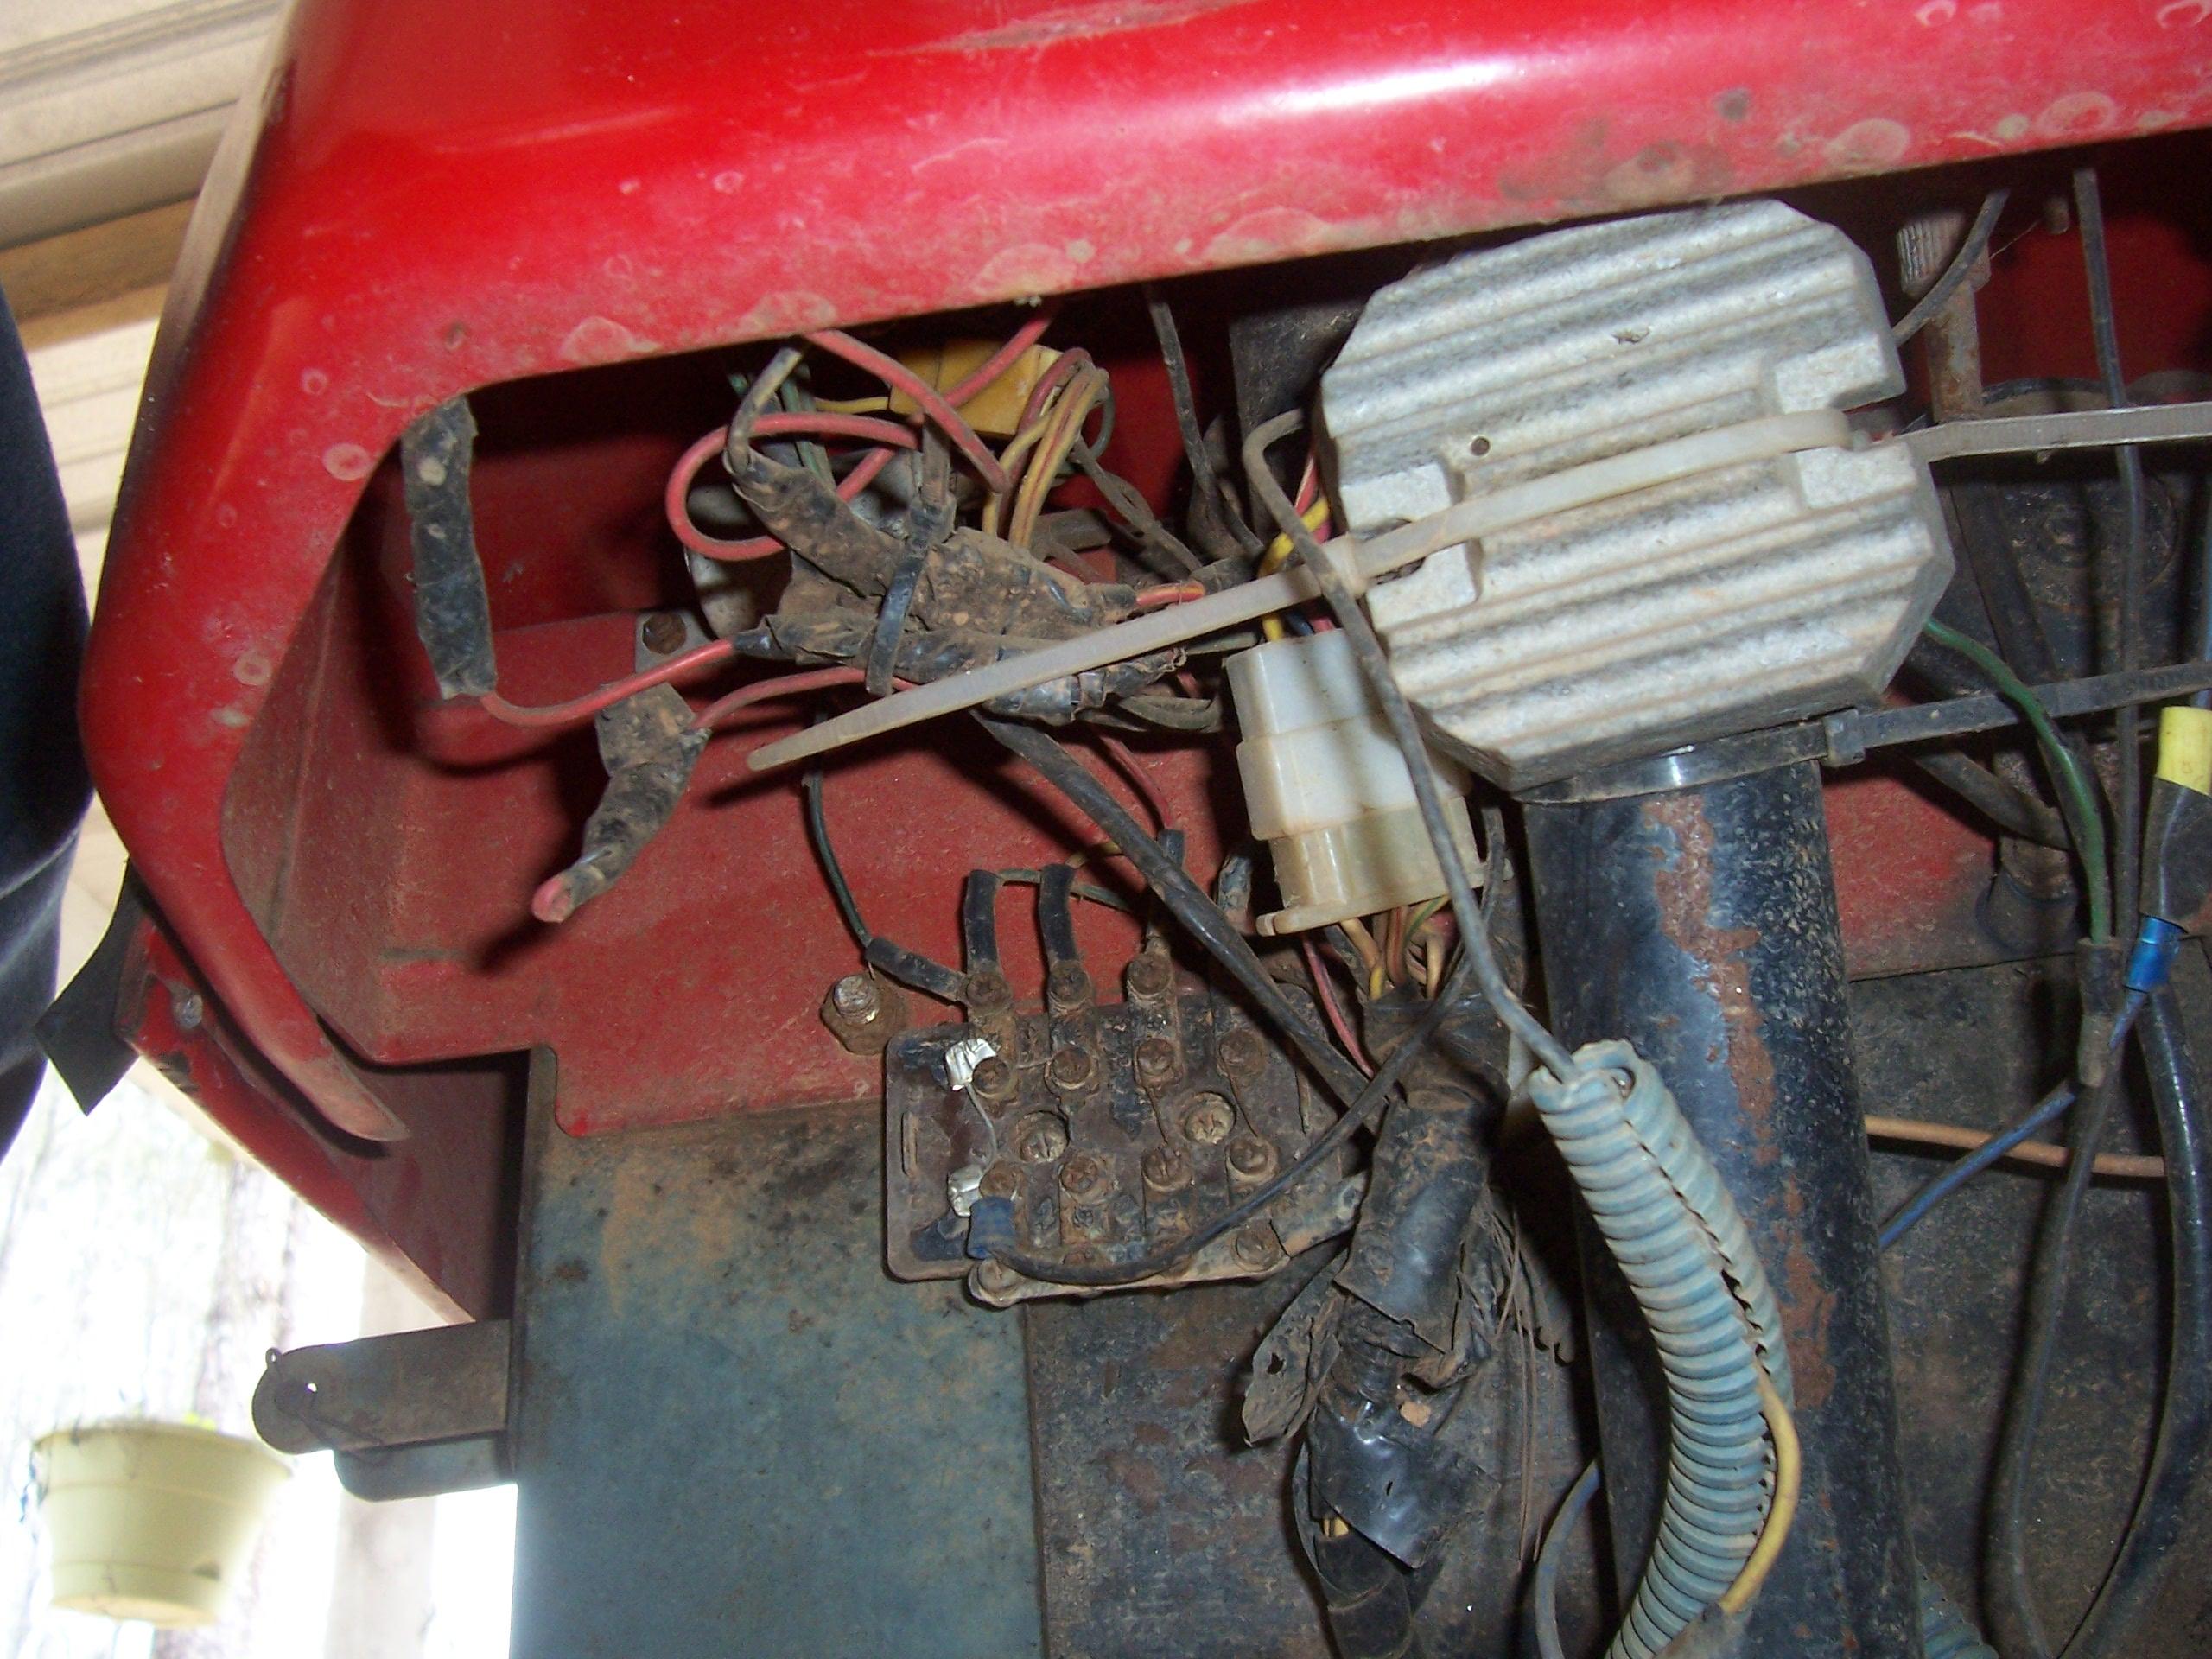 [DIAGRAM_5UK]  XH_3570] Fuse Box For Kubota L3710 Schematic Wiring   Kubota Rv T900 Fuse Box      Vell Alia Coun Subd Nuvit Atota Emba Mohammedshrine Librar Wiring 101